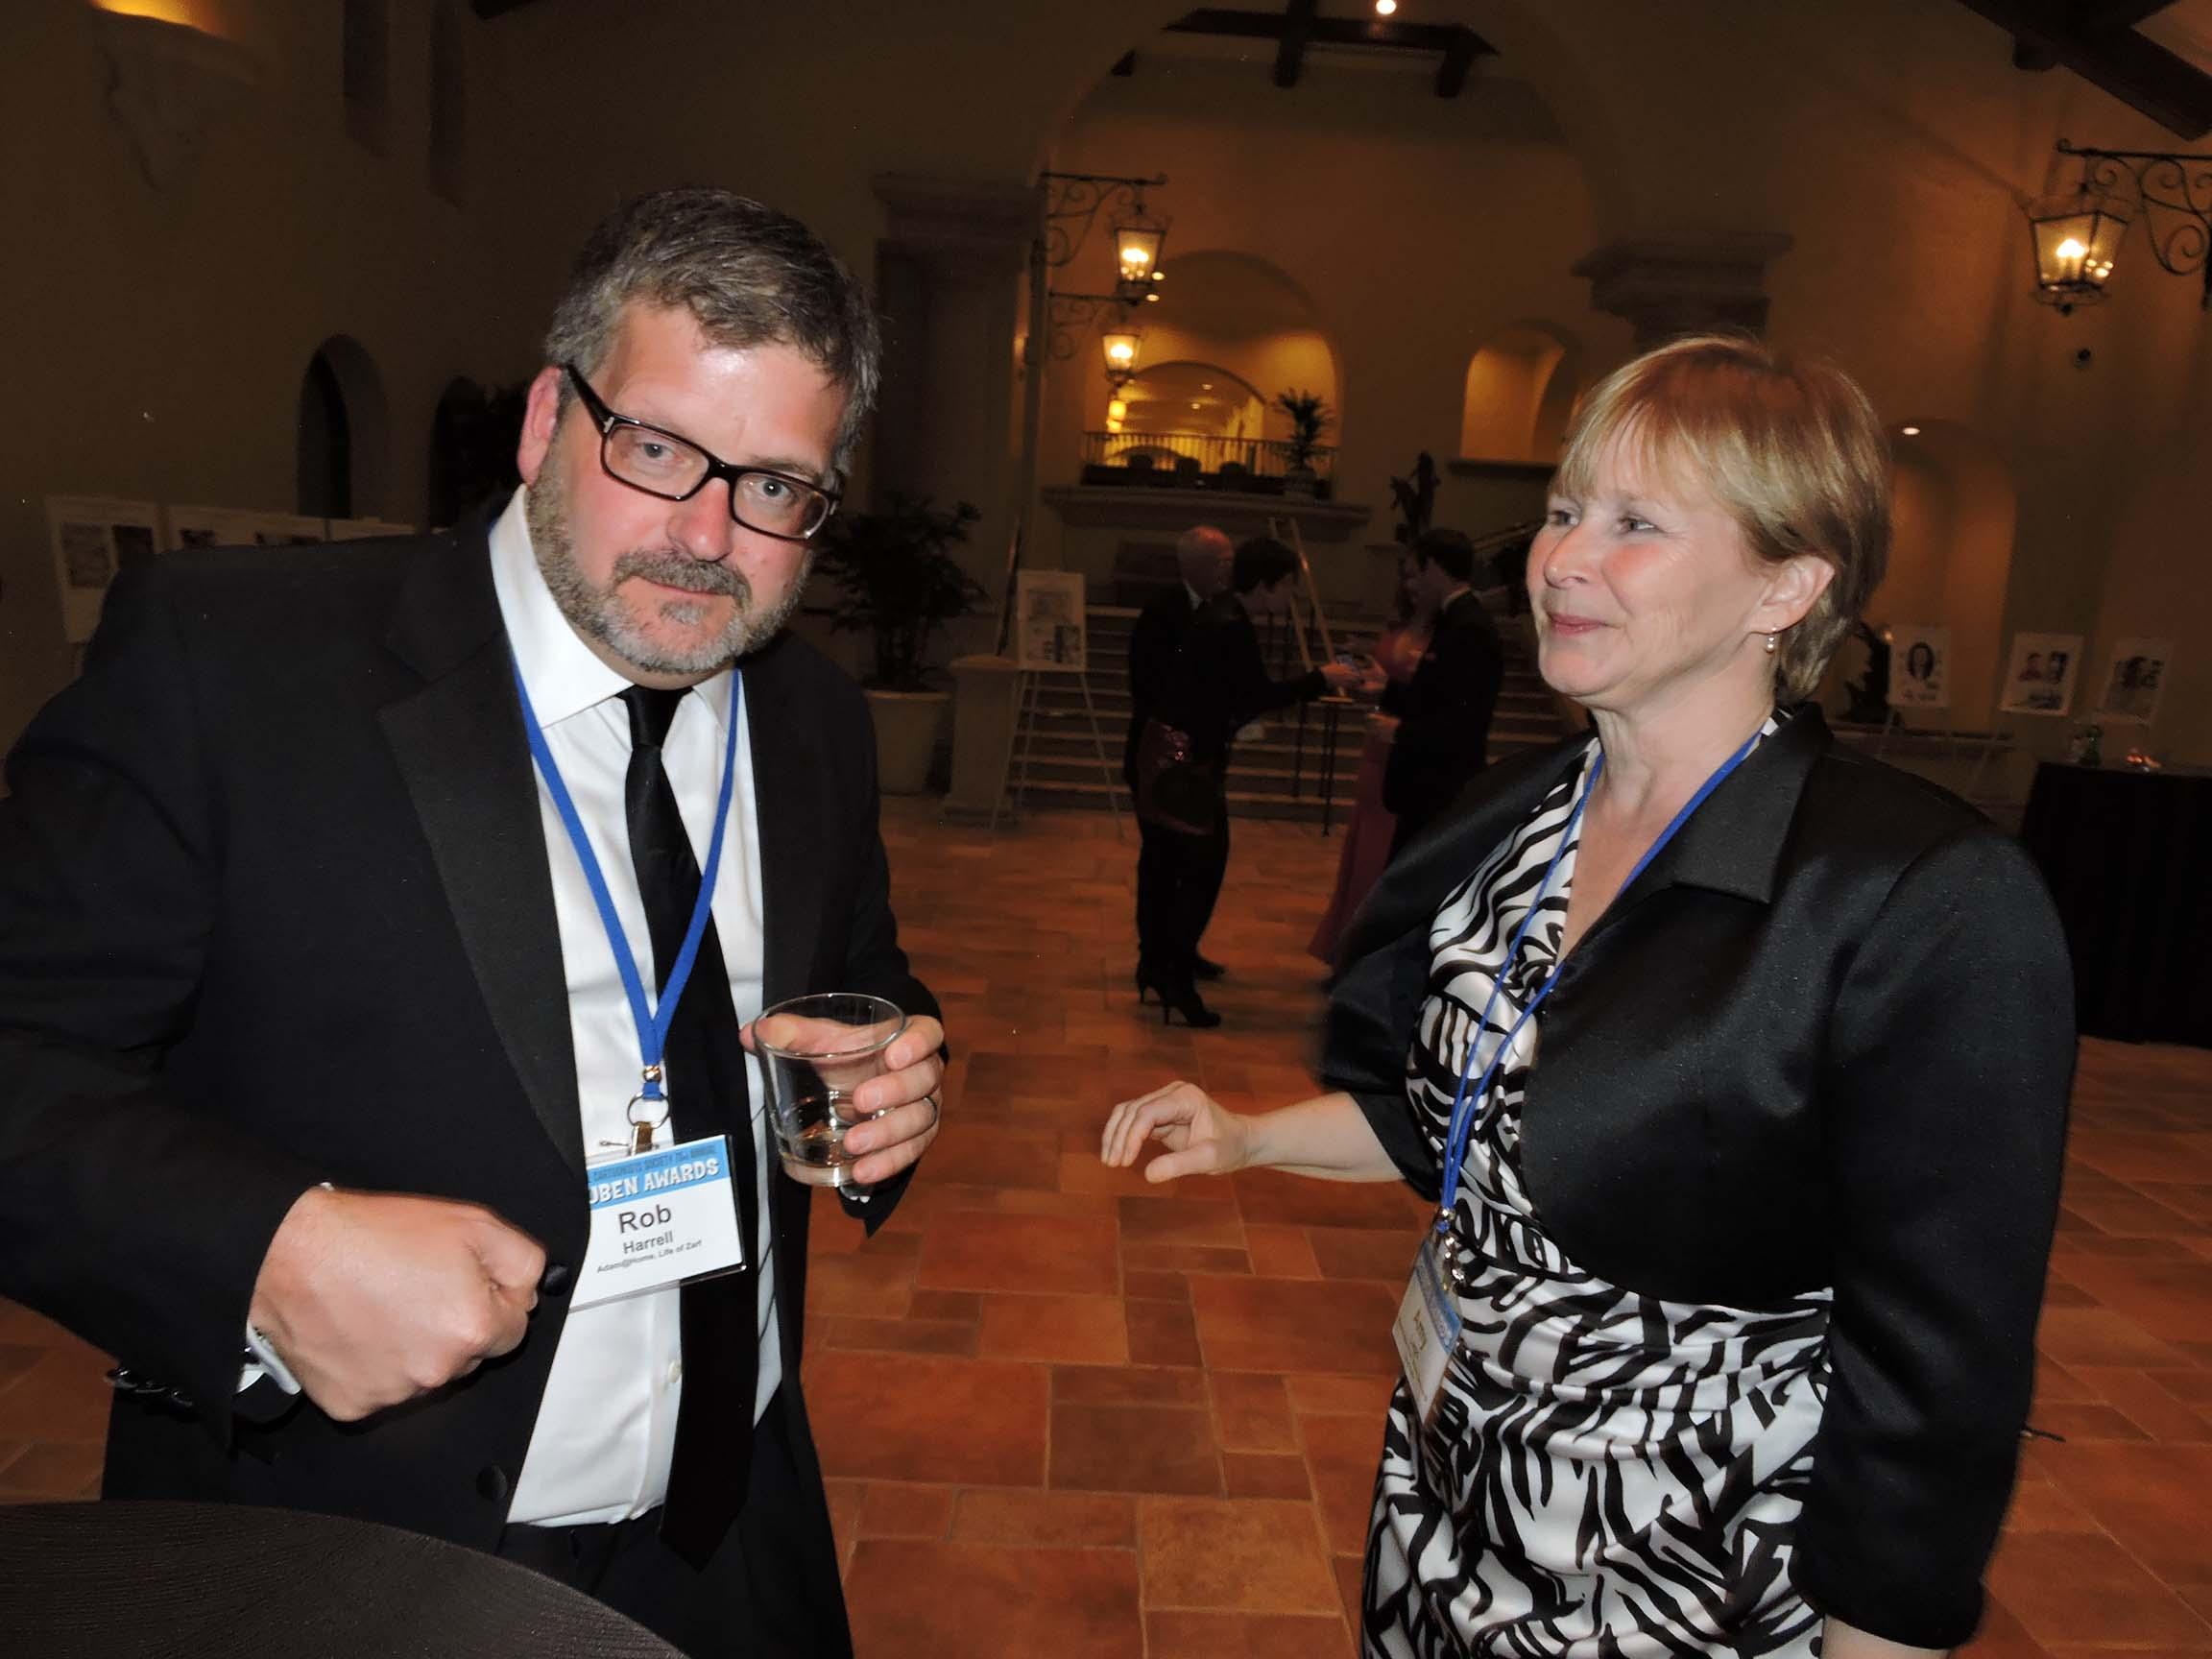 Rob Harrell and Amy Lago